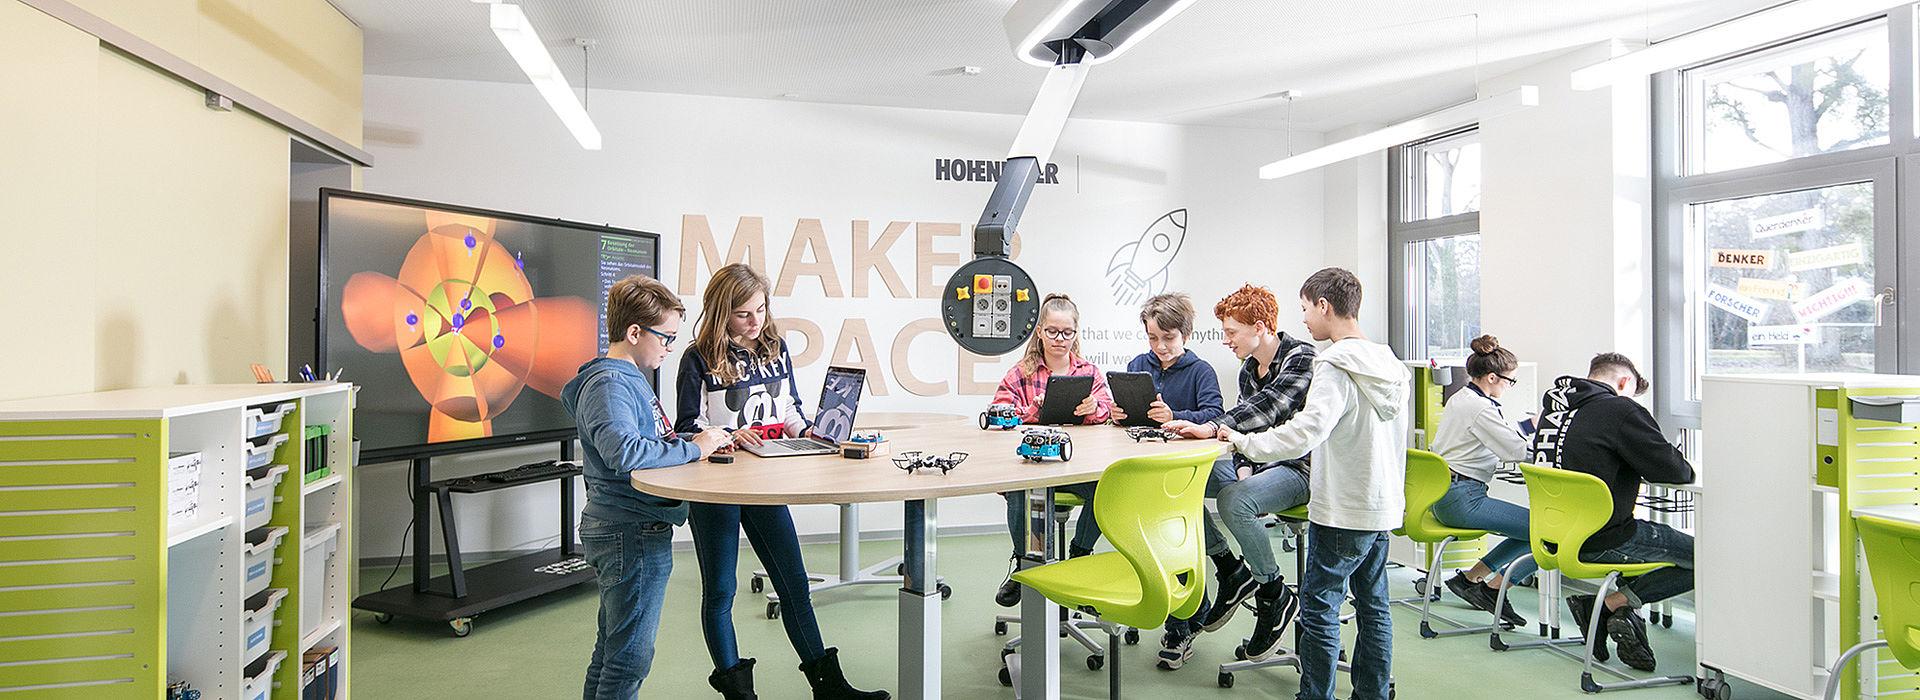 Bild: Coding & Robotics im Makerspace